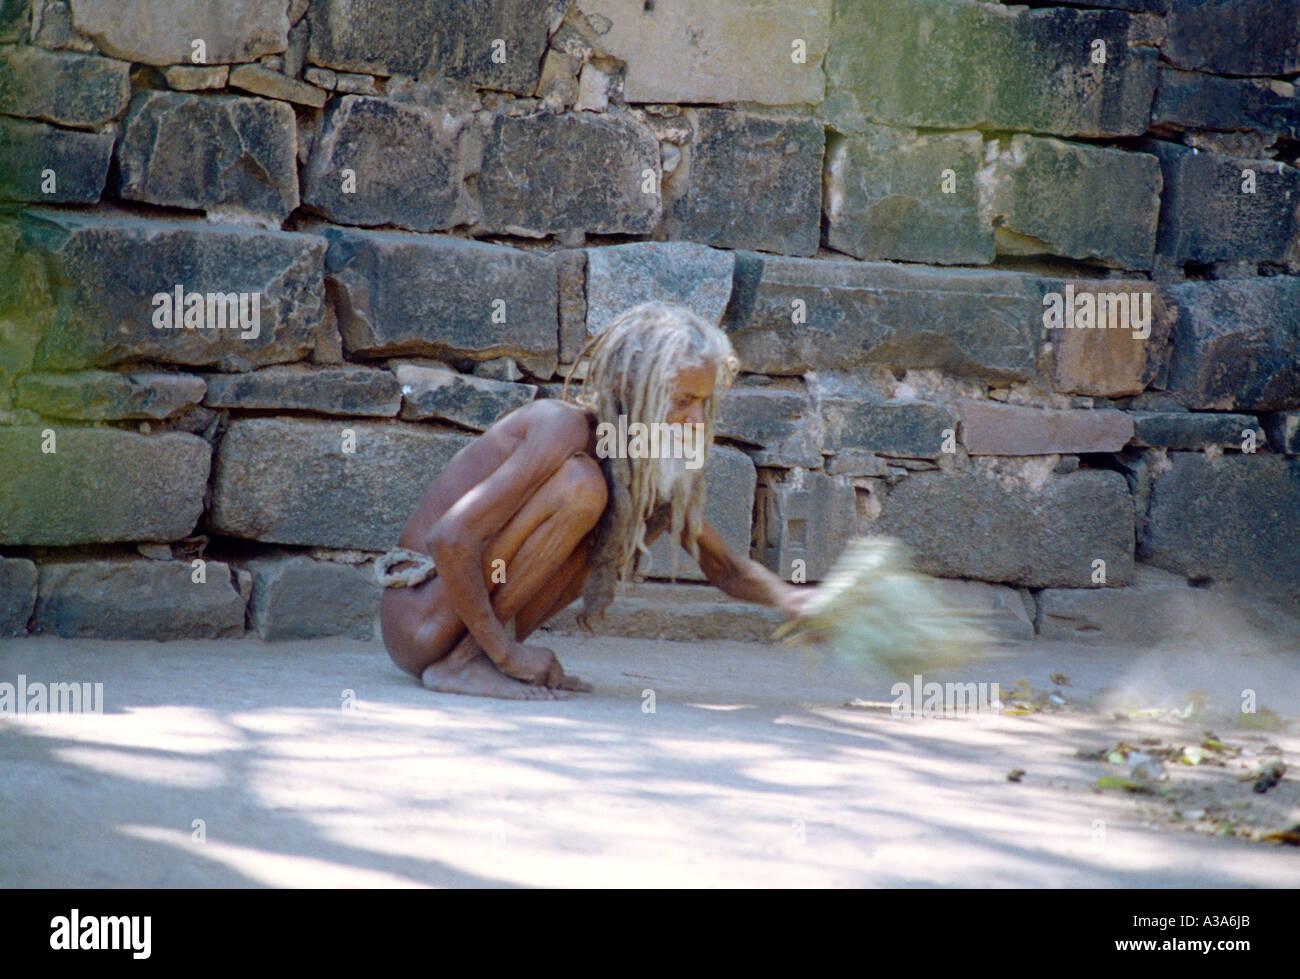 Khajuraho India Sweeping Temple Grounds As Act Of Piety Menial Job - Stock Image